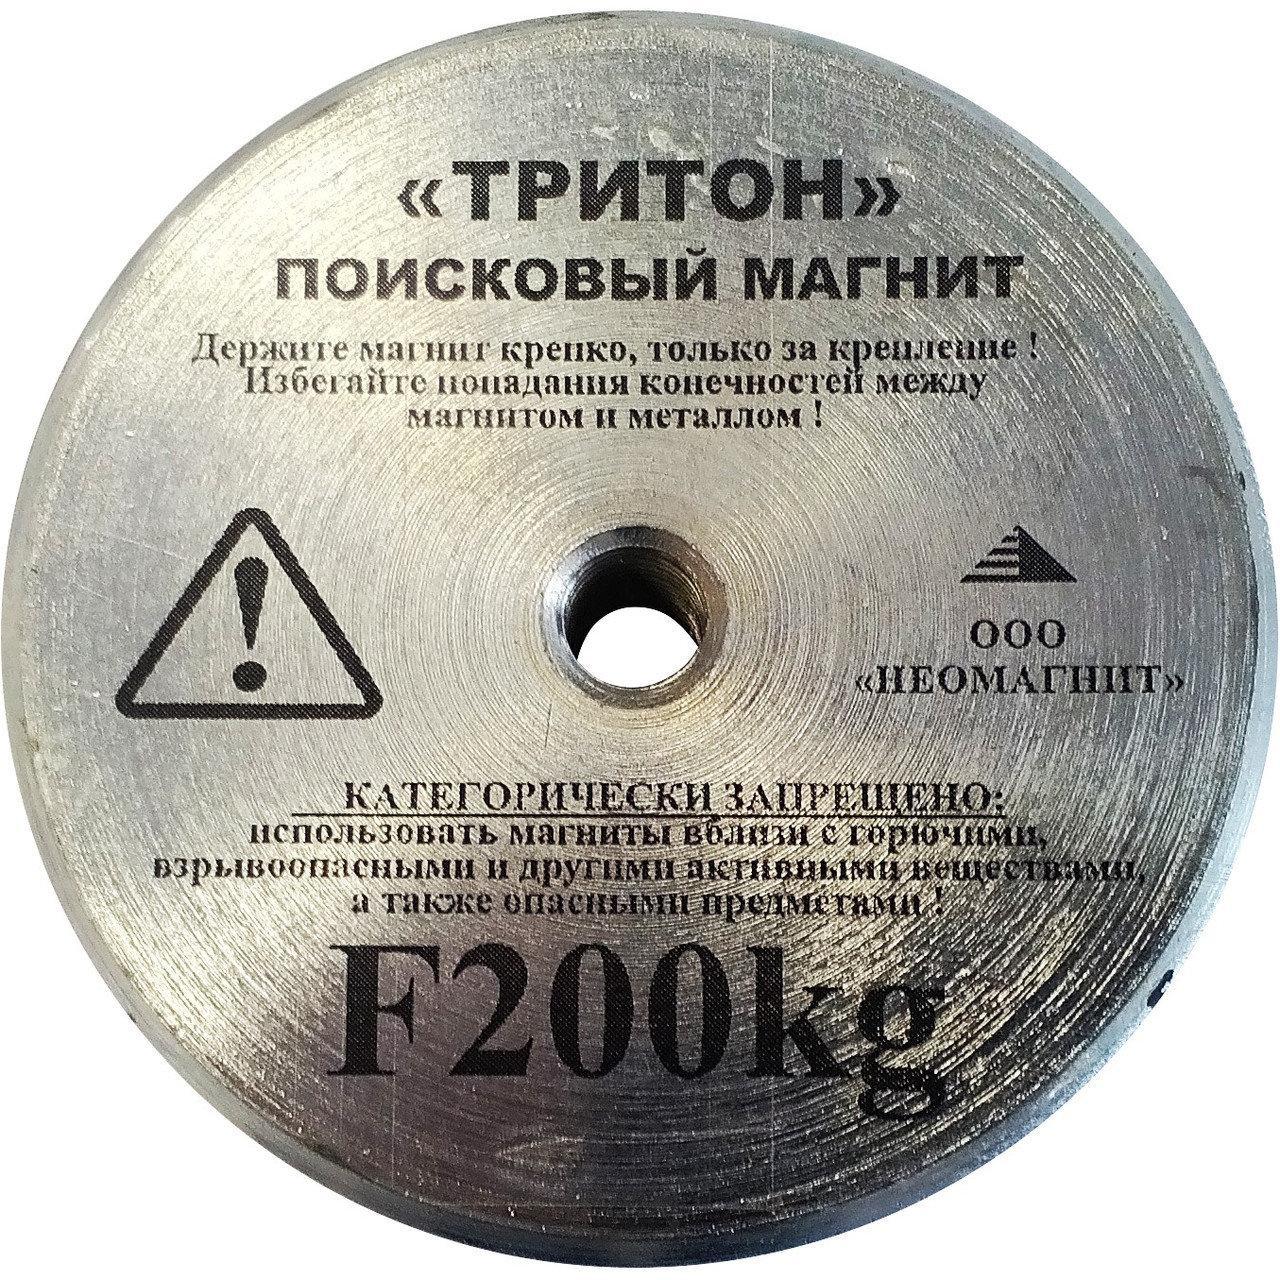 Писковый магнит ТРИТОН F200, односторонний